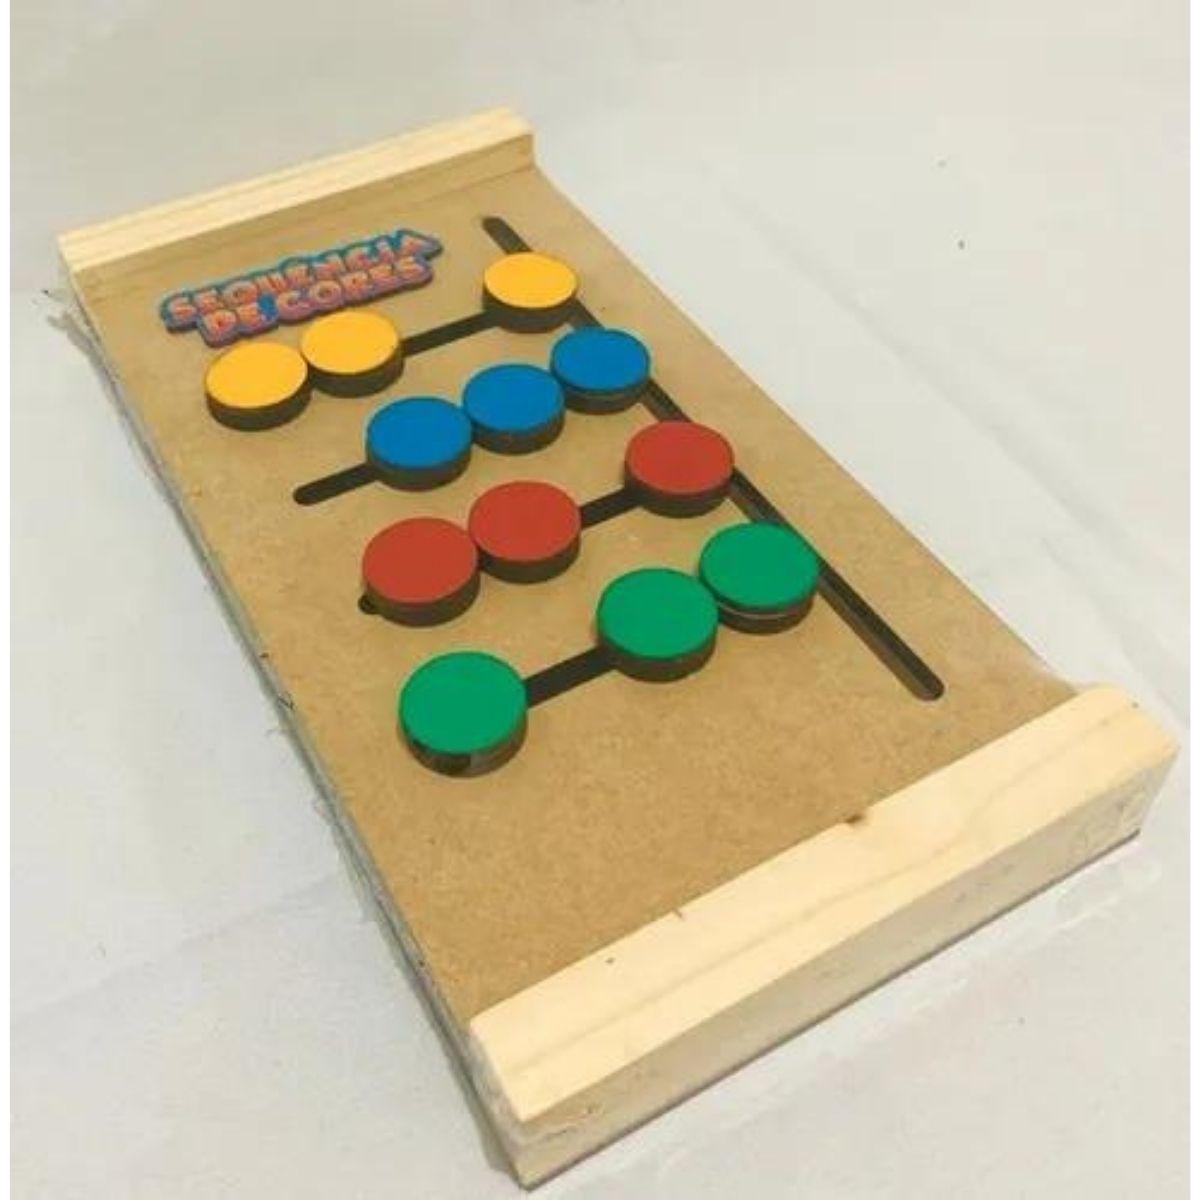 Brinquedo Pedagógico e Educativo - Sequencia De Cores